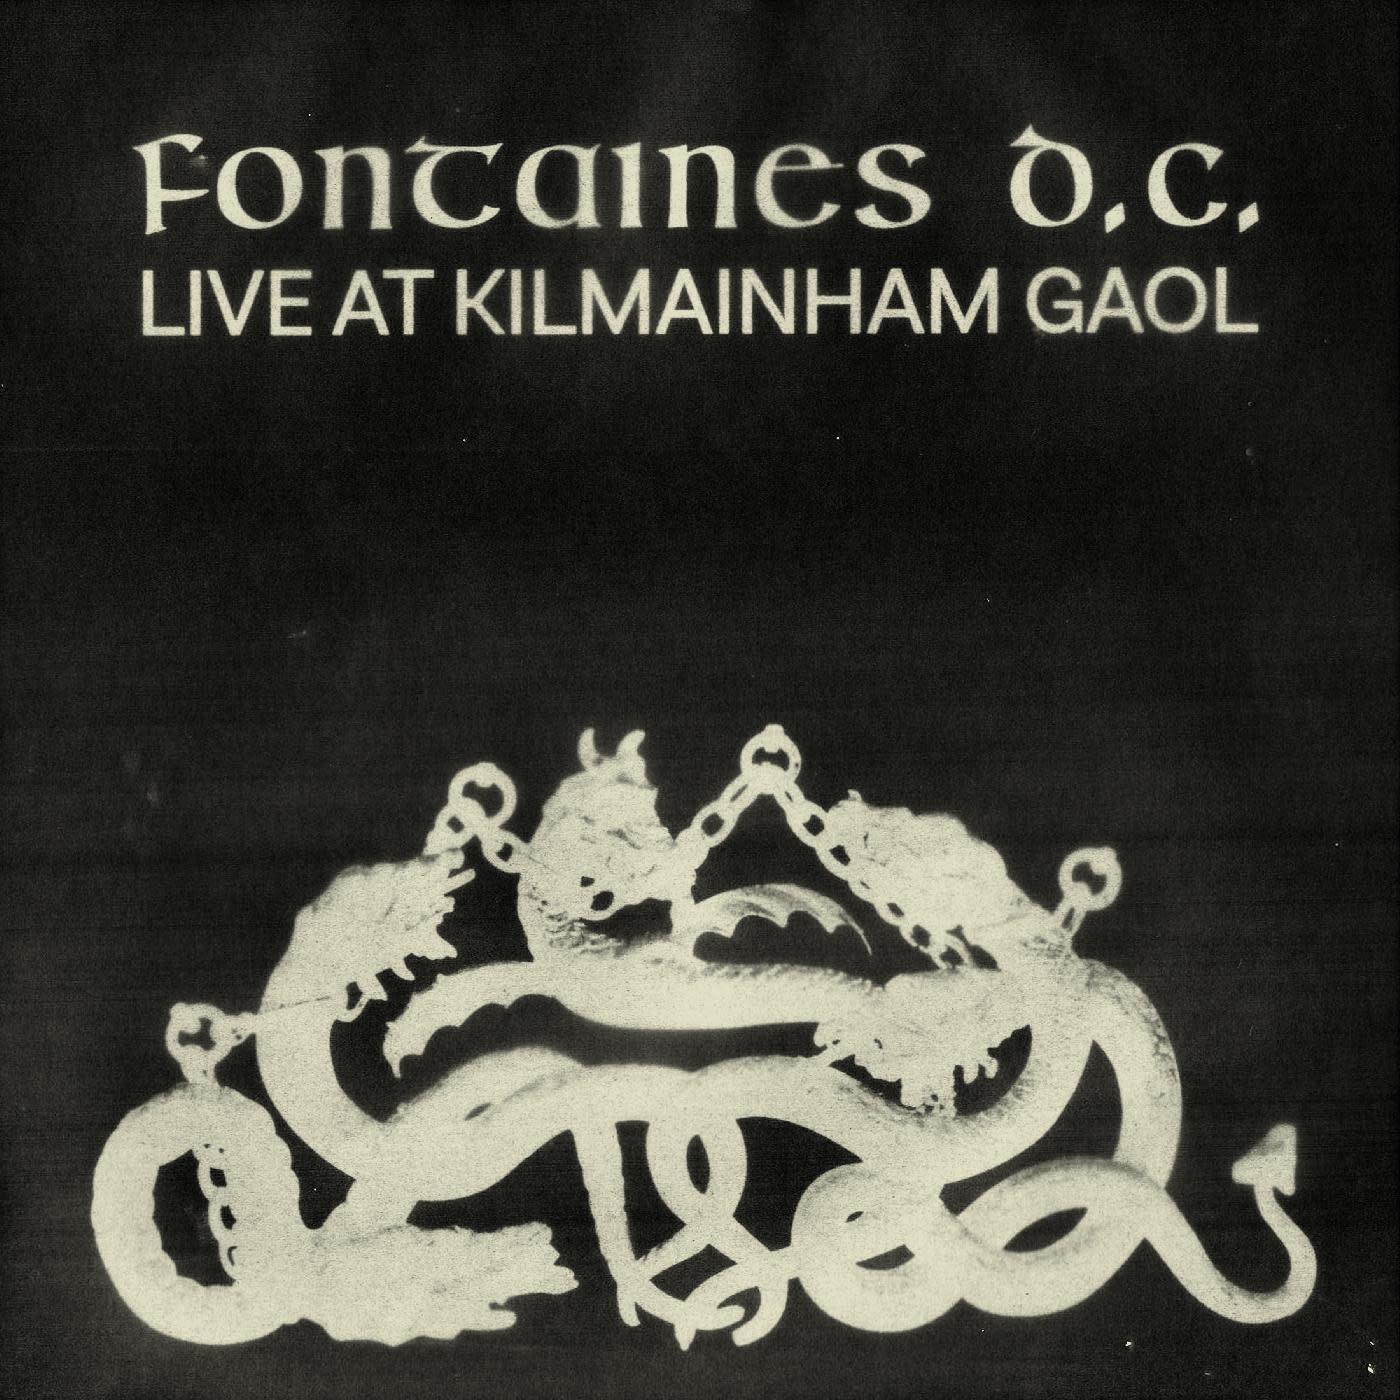 Fontaines D.C. - Live at Kilmainham Gaol